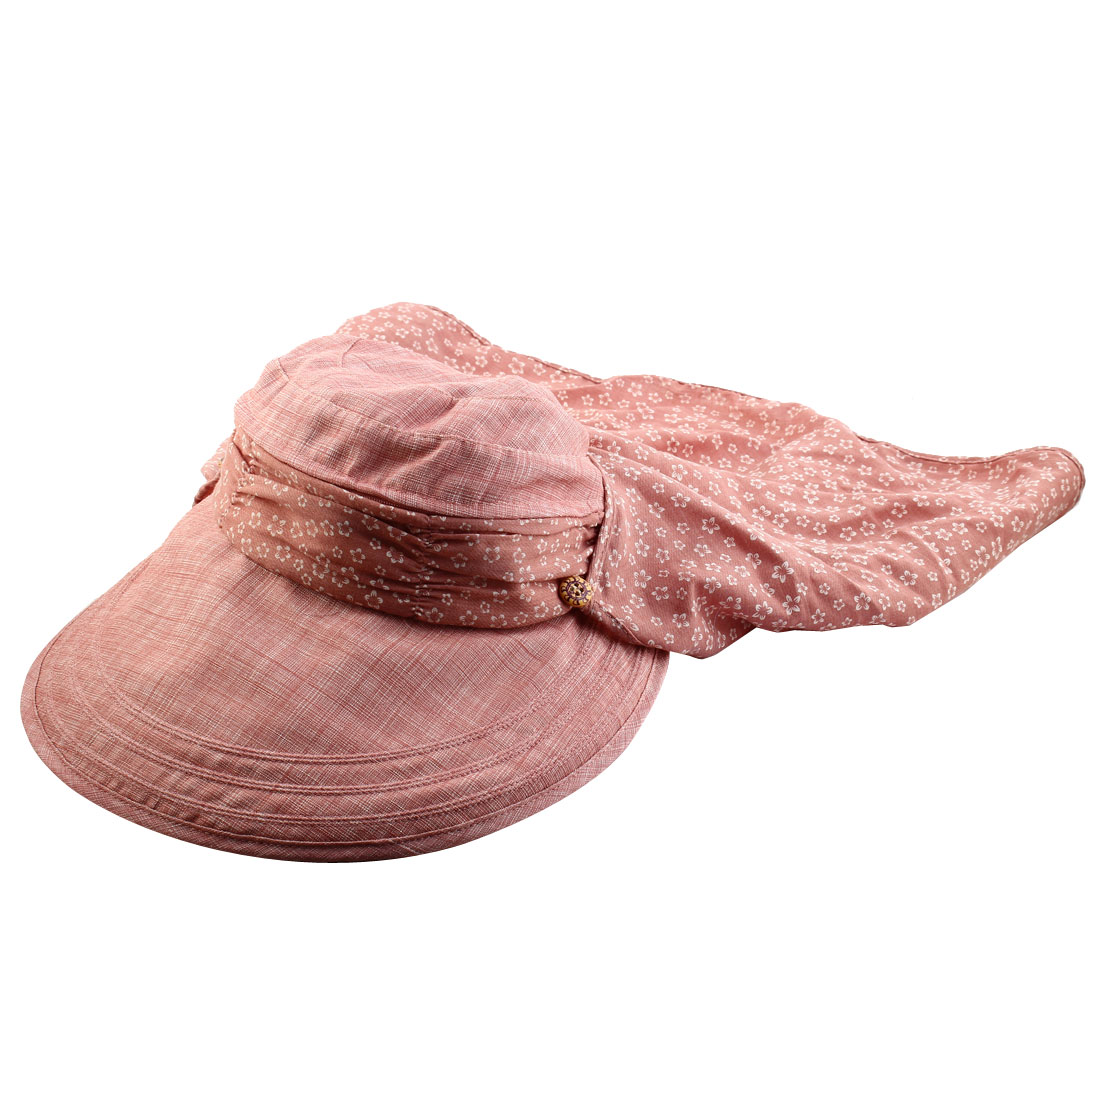 Lady Flower Printed Neck Protection Wide Brim Summer Floppy Cap Sun Visor Hat Coral Pink